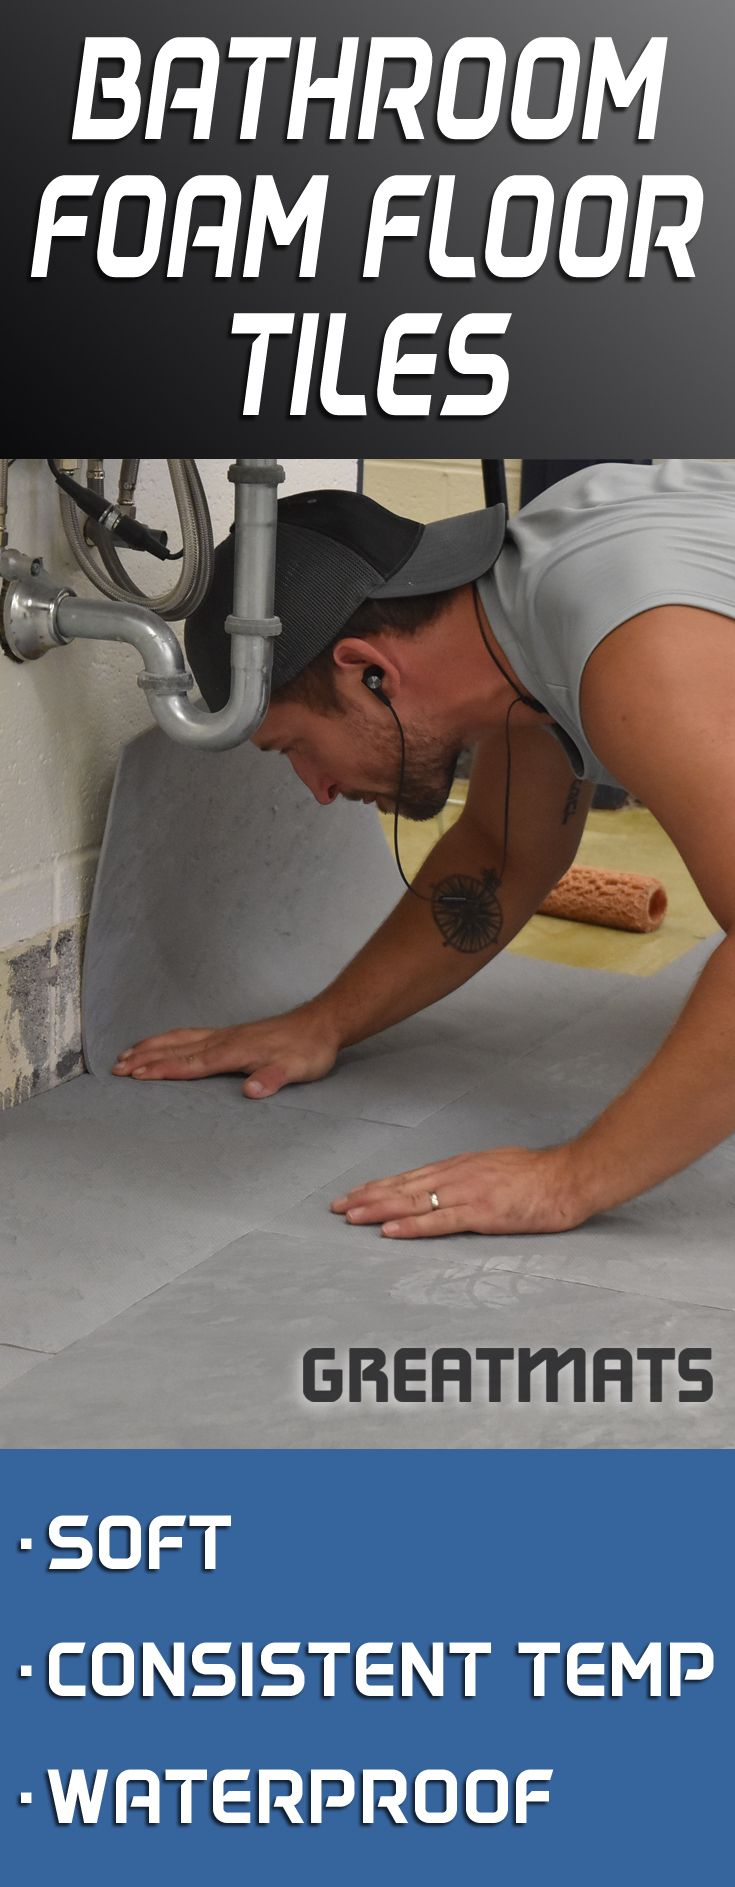 Life Floor Ripple Tiles 3/16 Inch Bathroom flooring